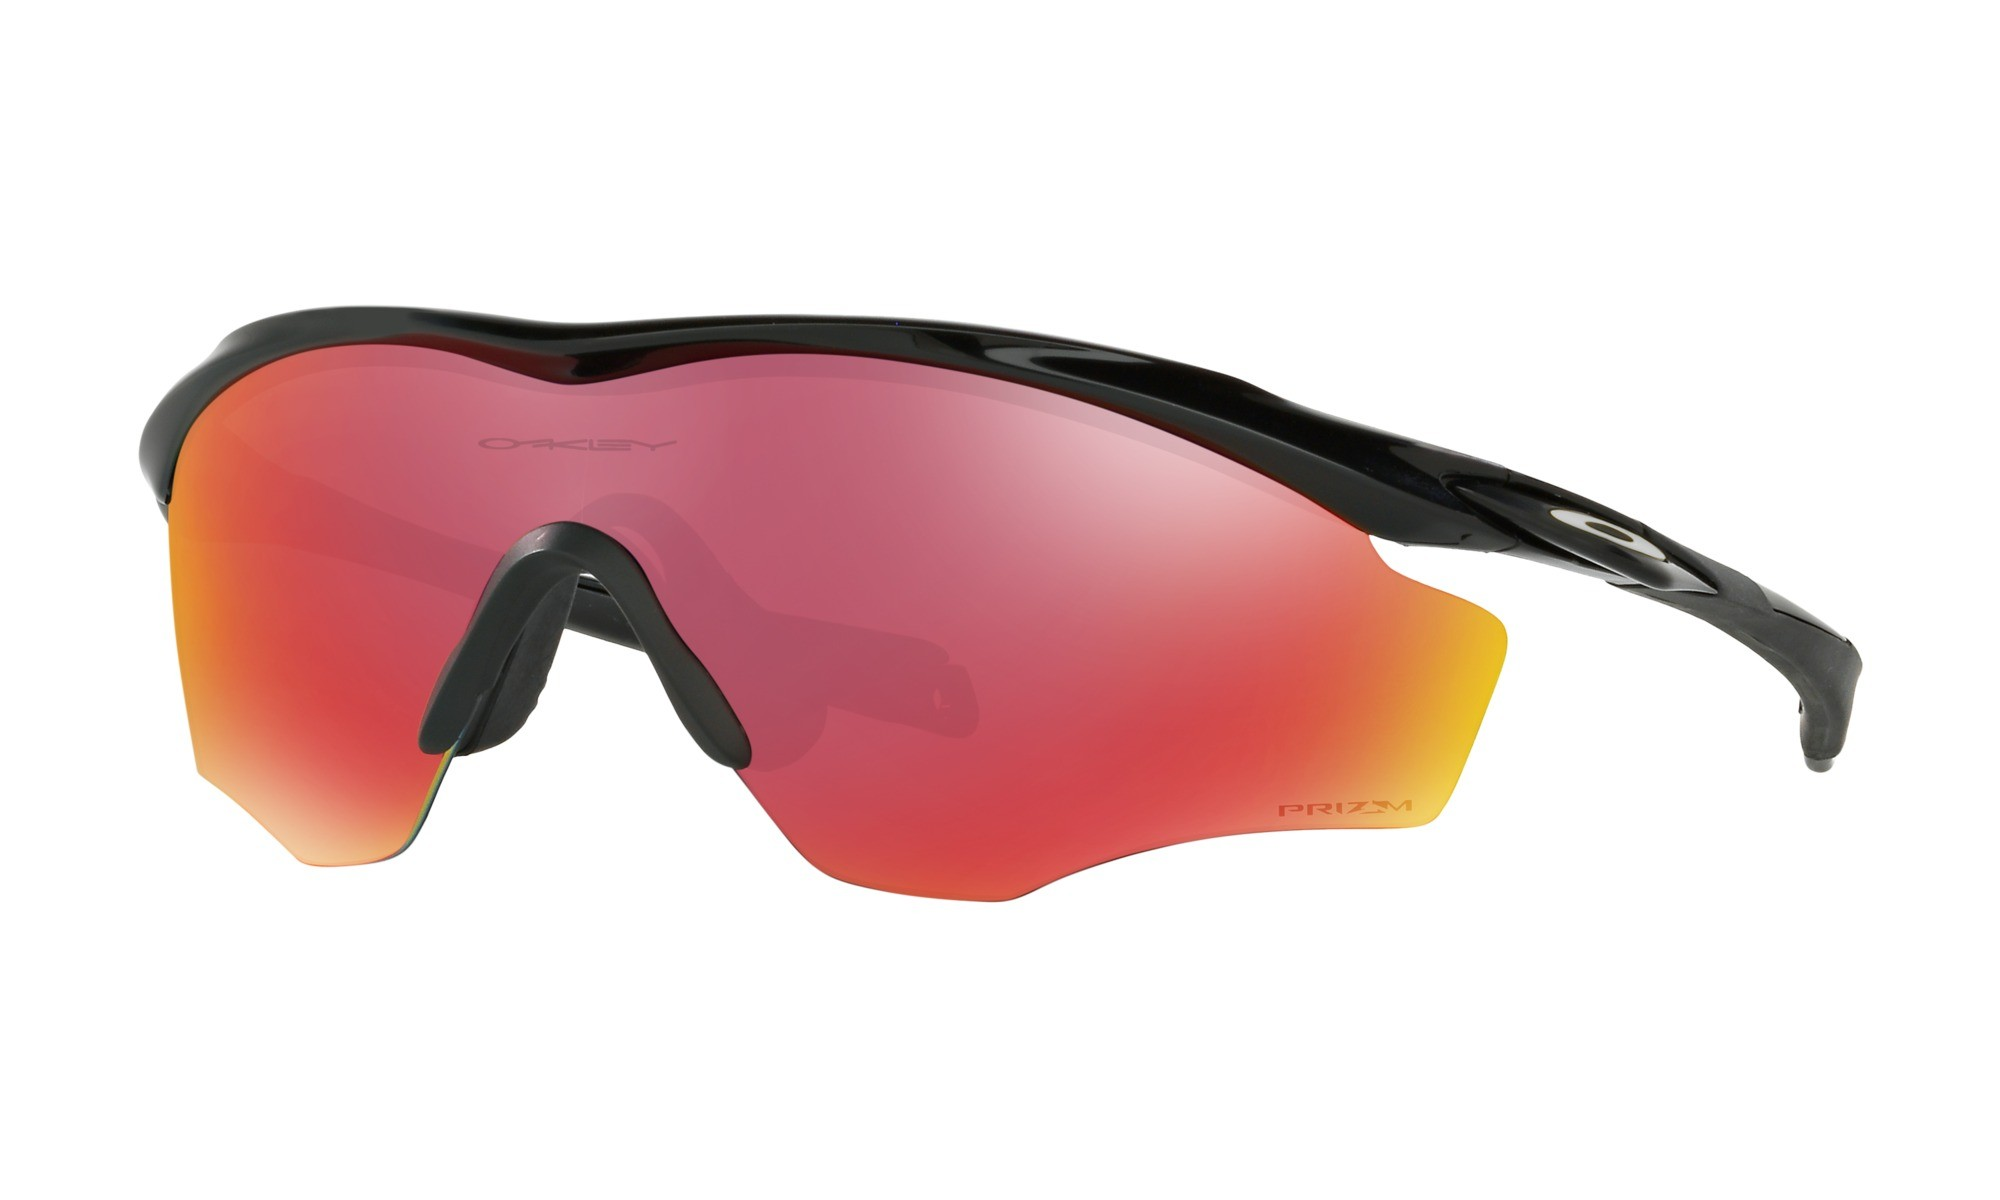 Frame Lens Wholesale Cricket Prizm Replica Oakley Black Usa Sunglasses dCBeQxEoWr